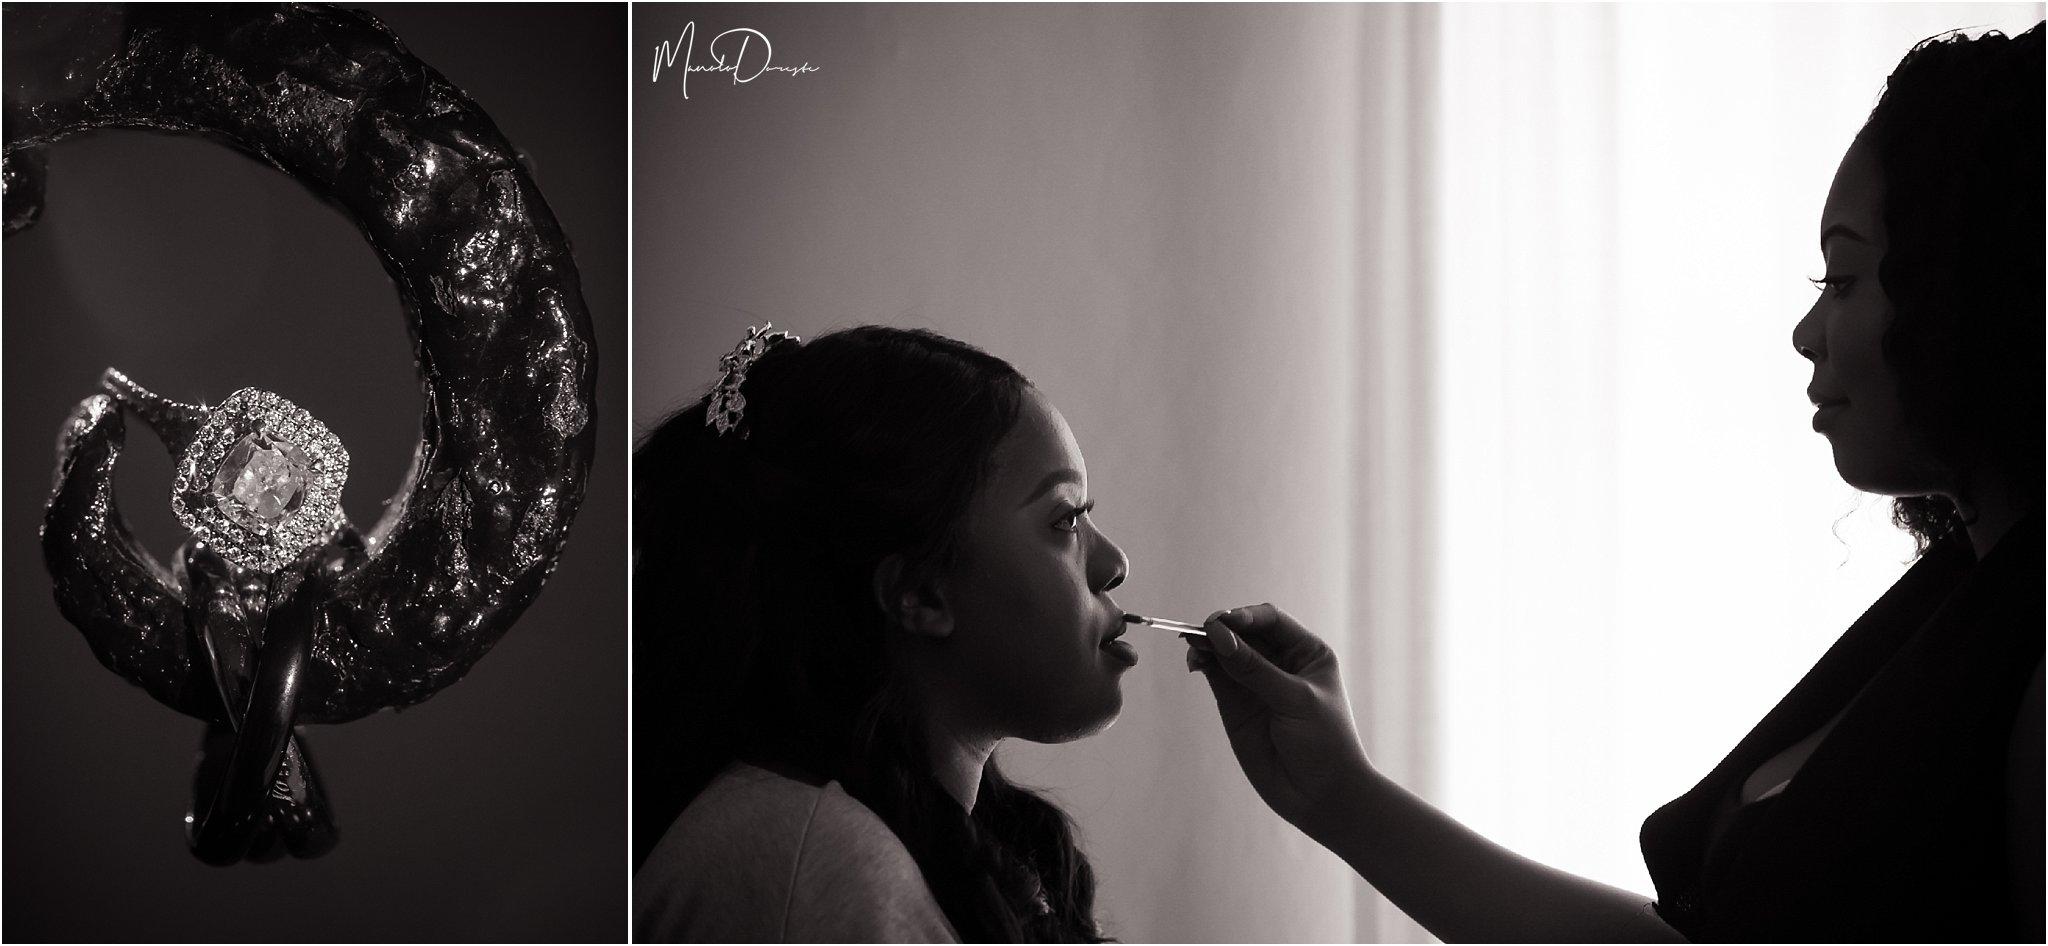 0416_ManoloDoreste_InFocusStudios_Wedding_Family_Photography_Miami_MiamiPhotographer.jpg